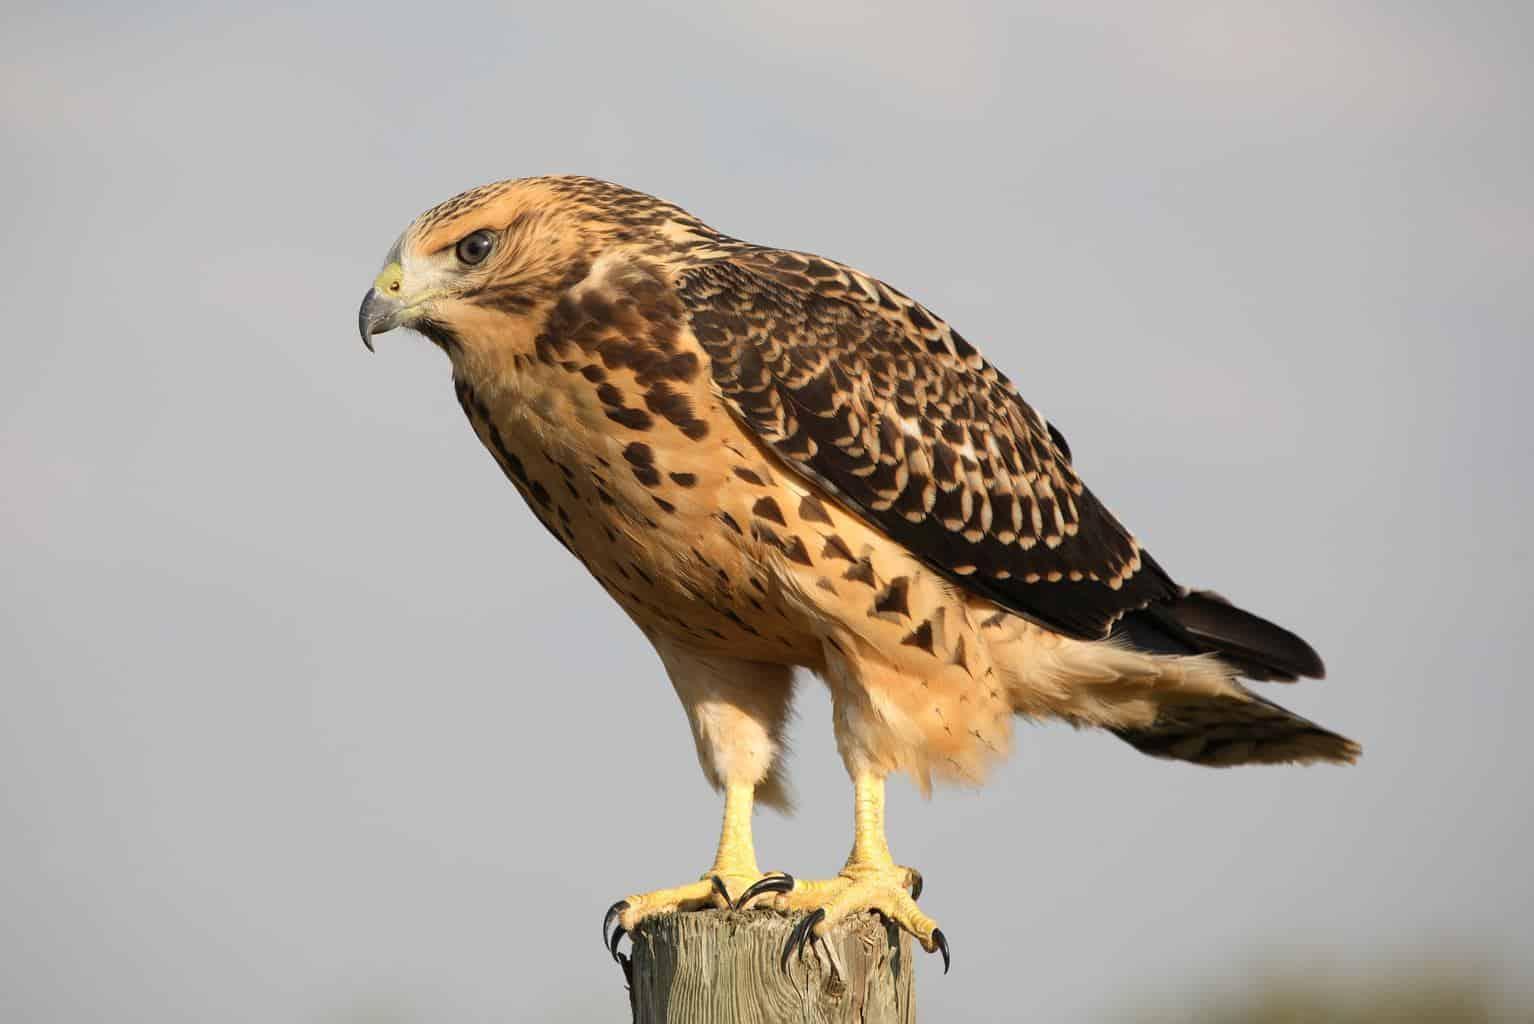 Hawks in Maryland